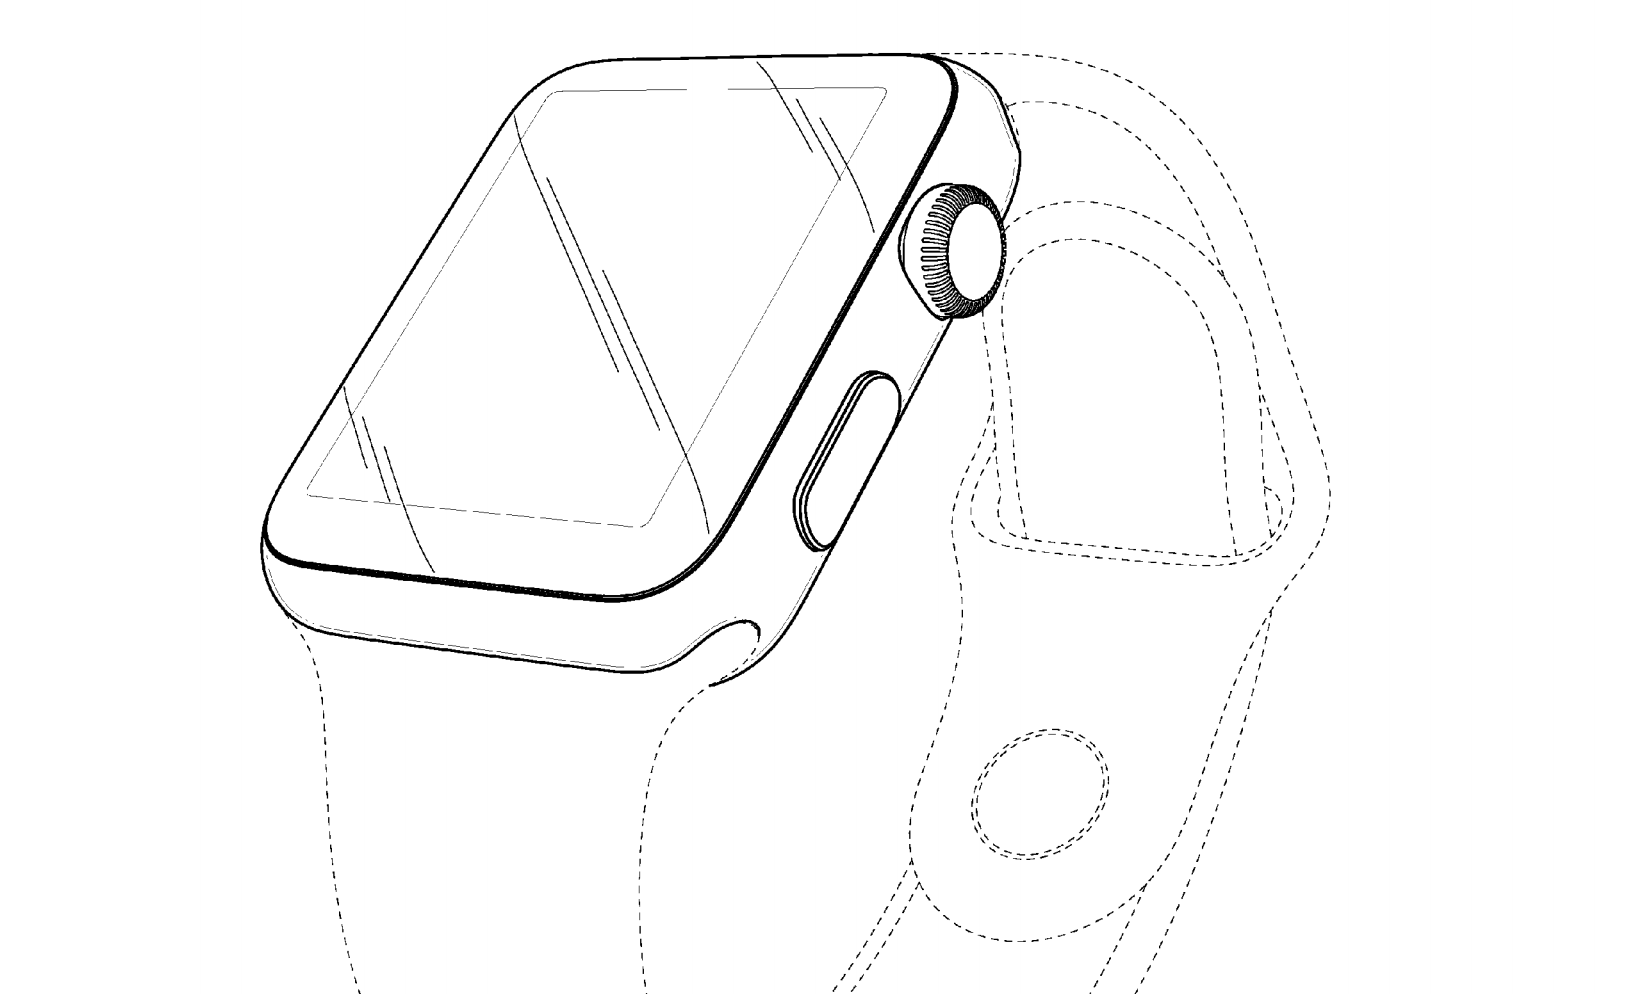 apple-watch-patent